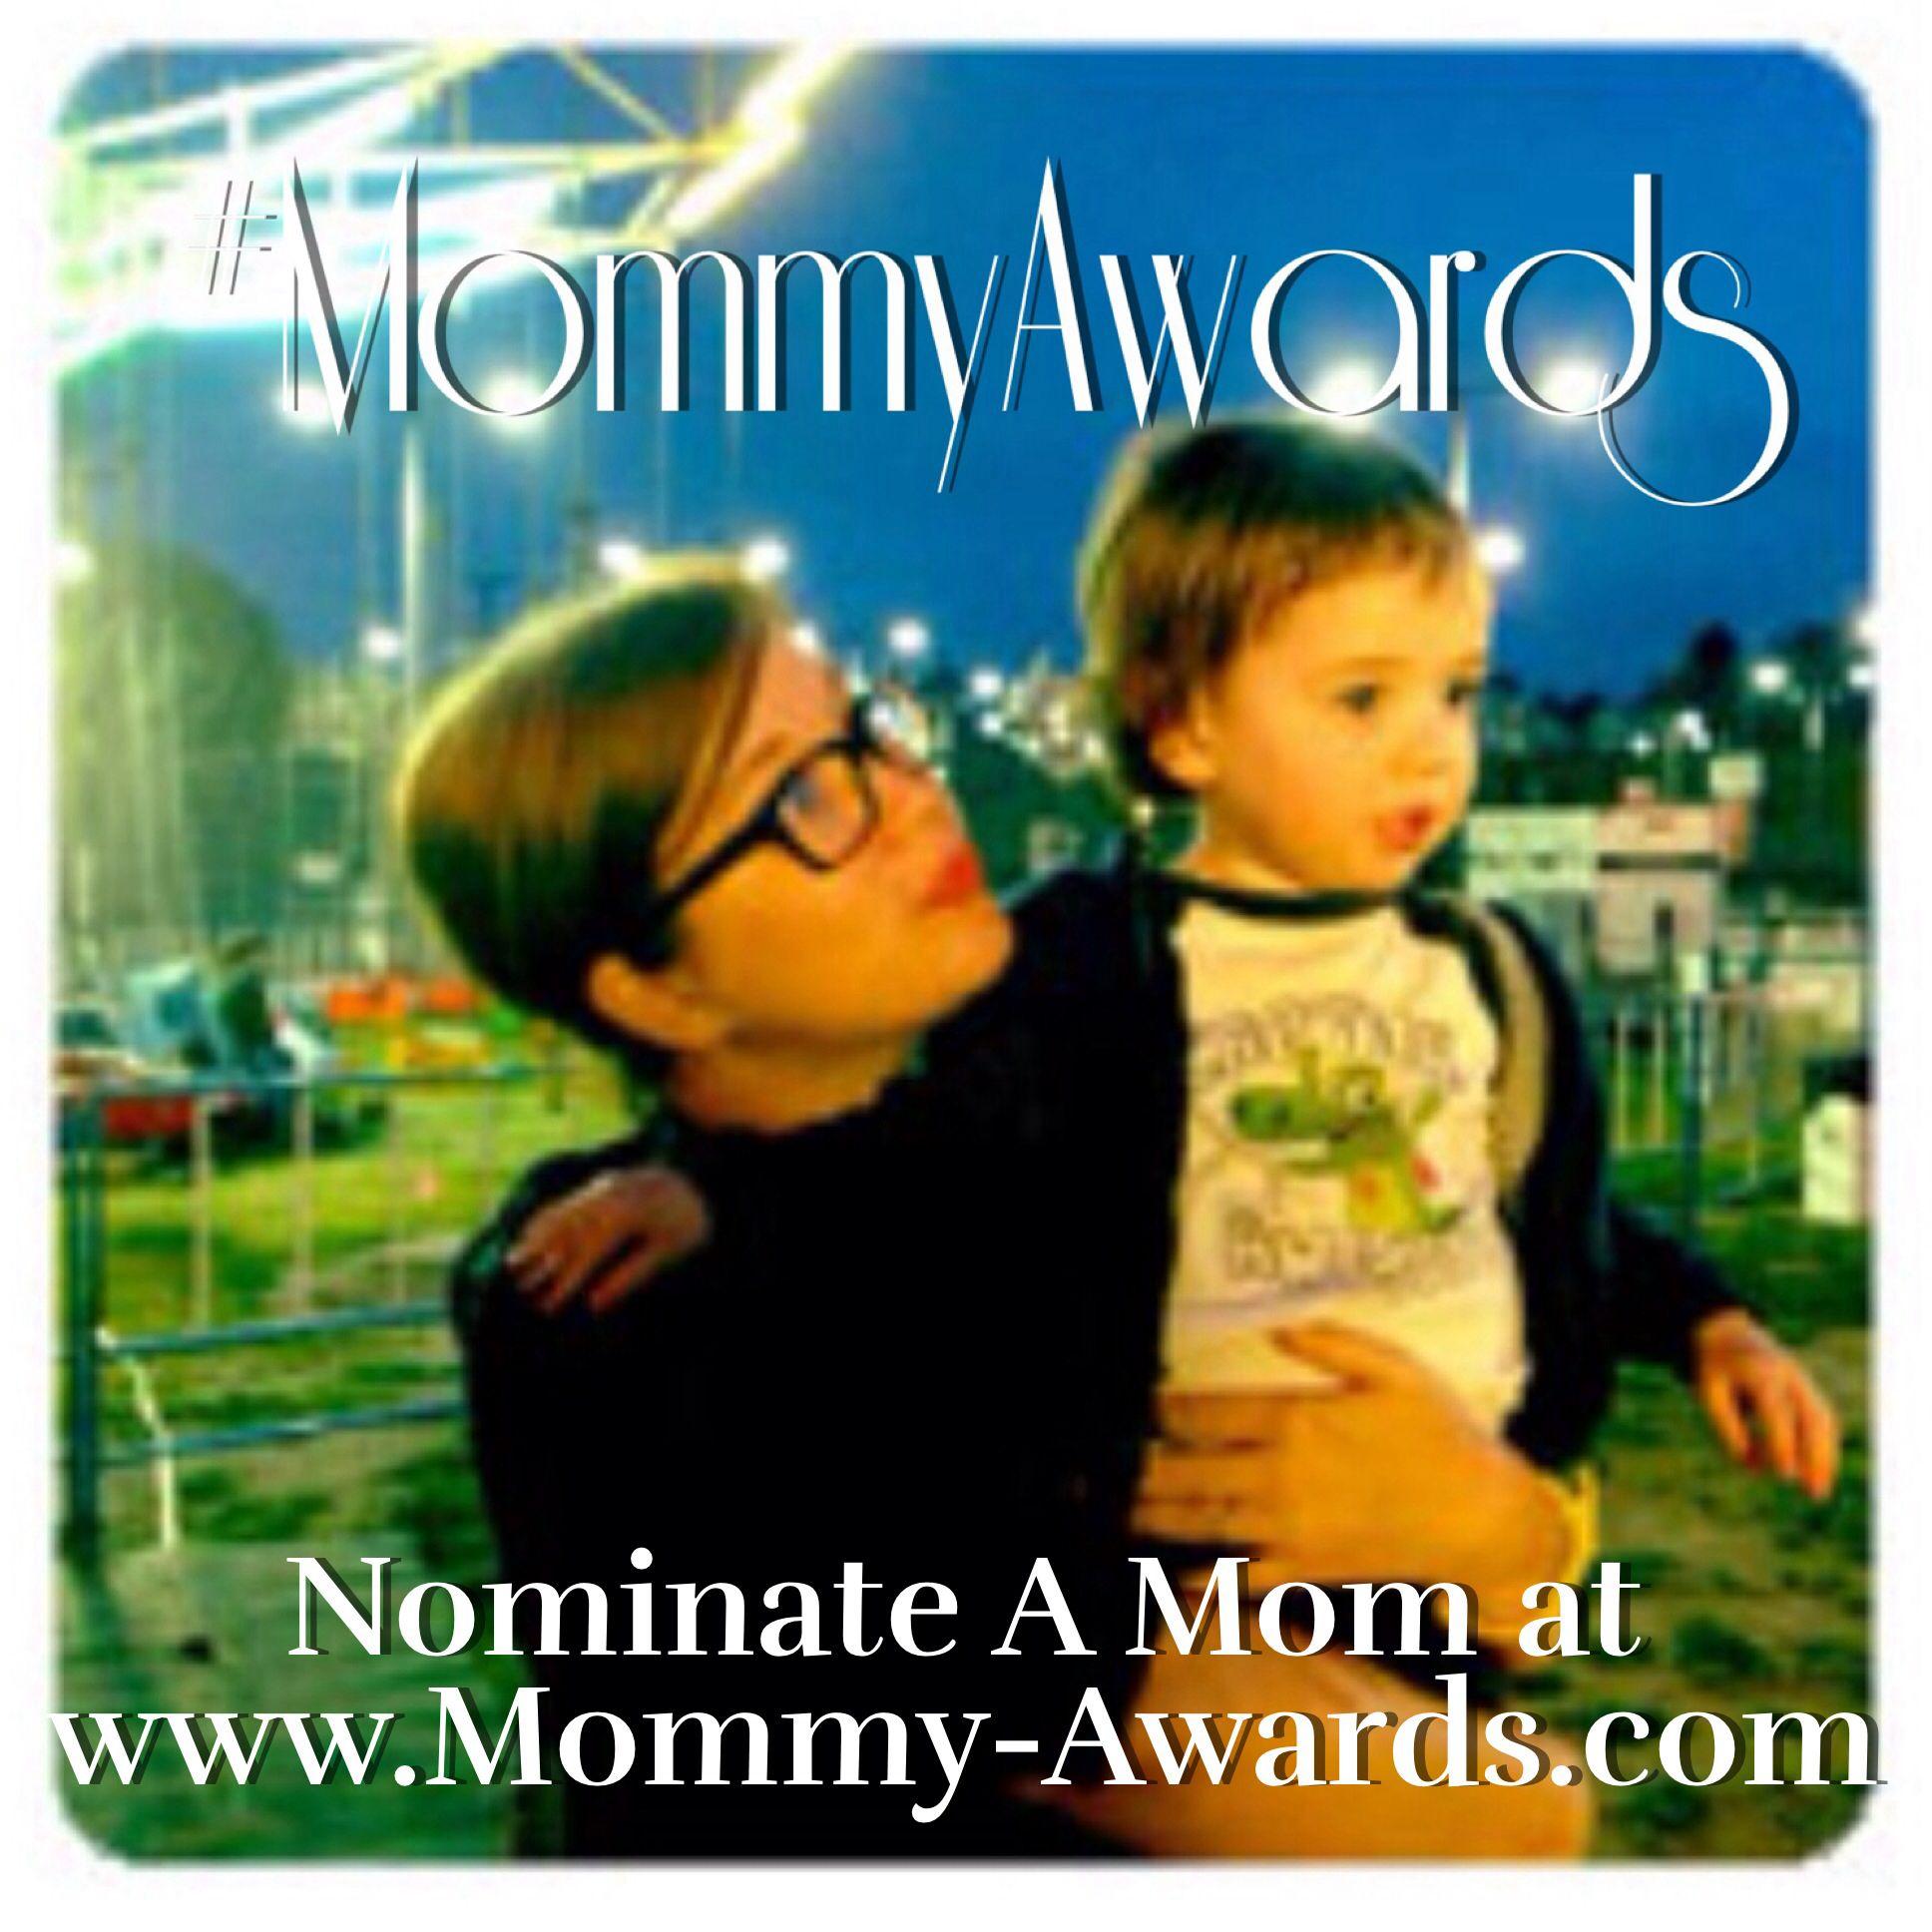 Meet Mommyawards Craftmommy Sally Torchinskey Who